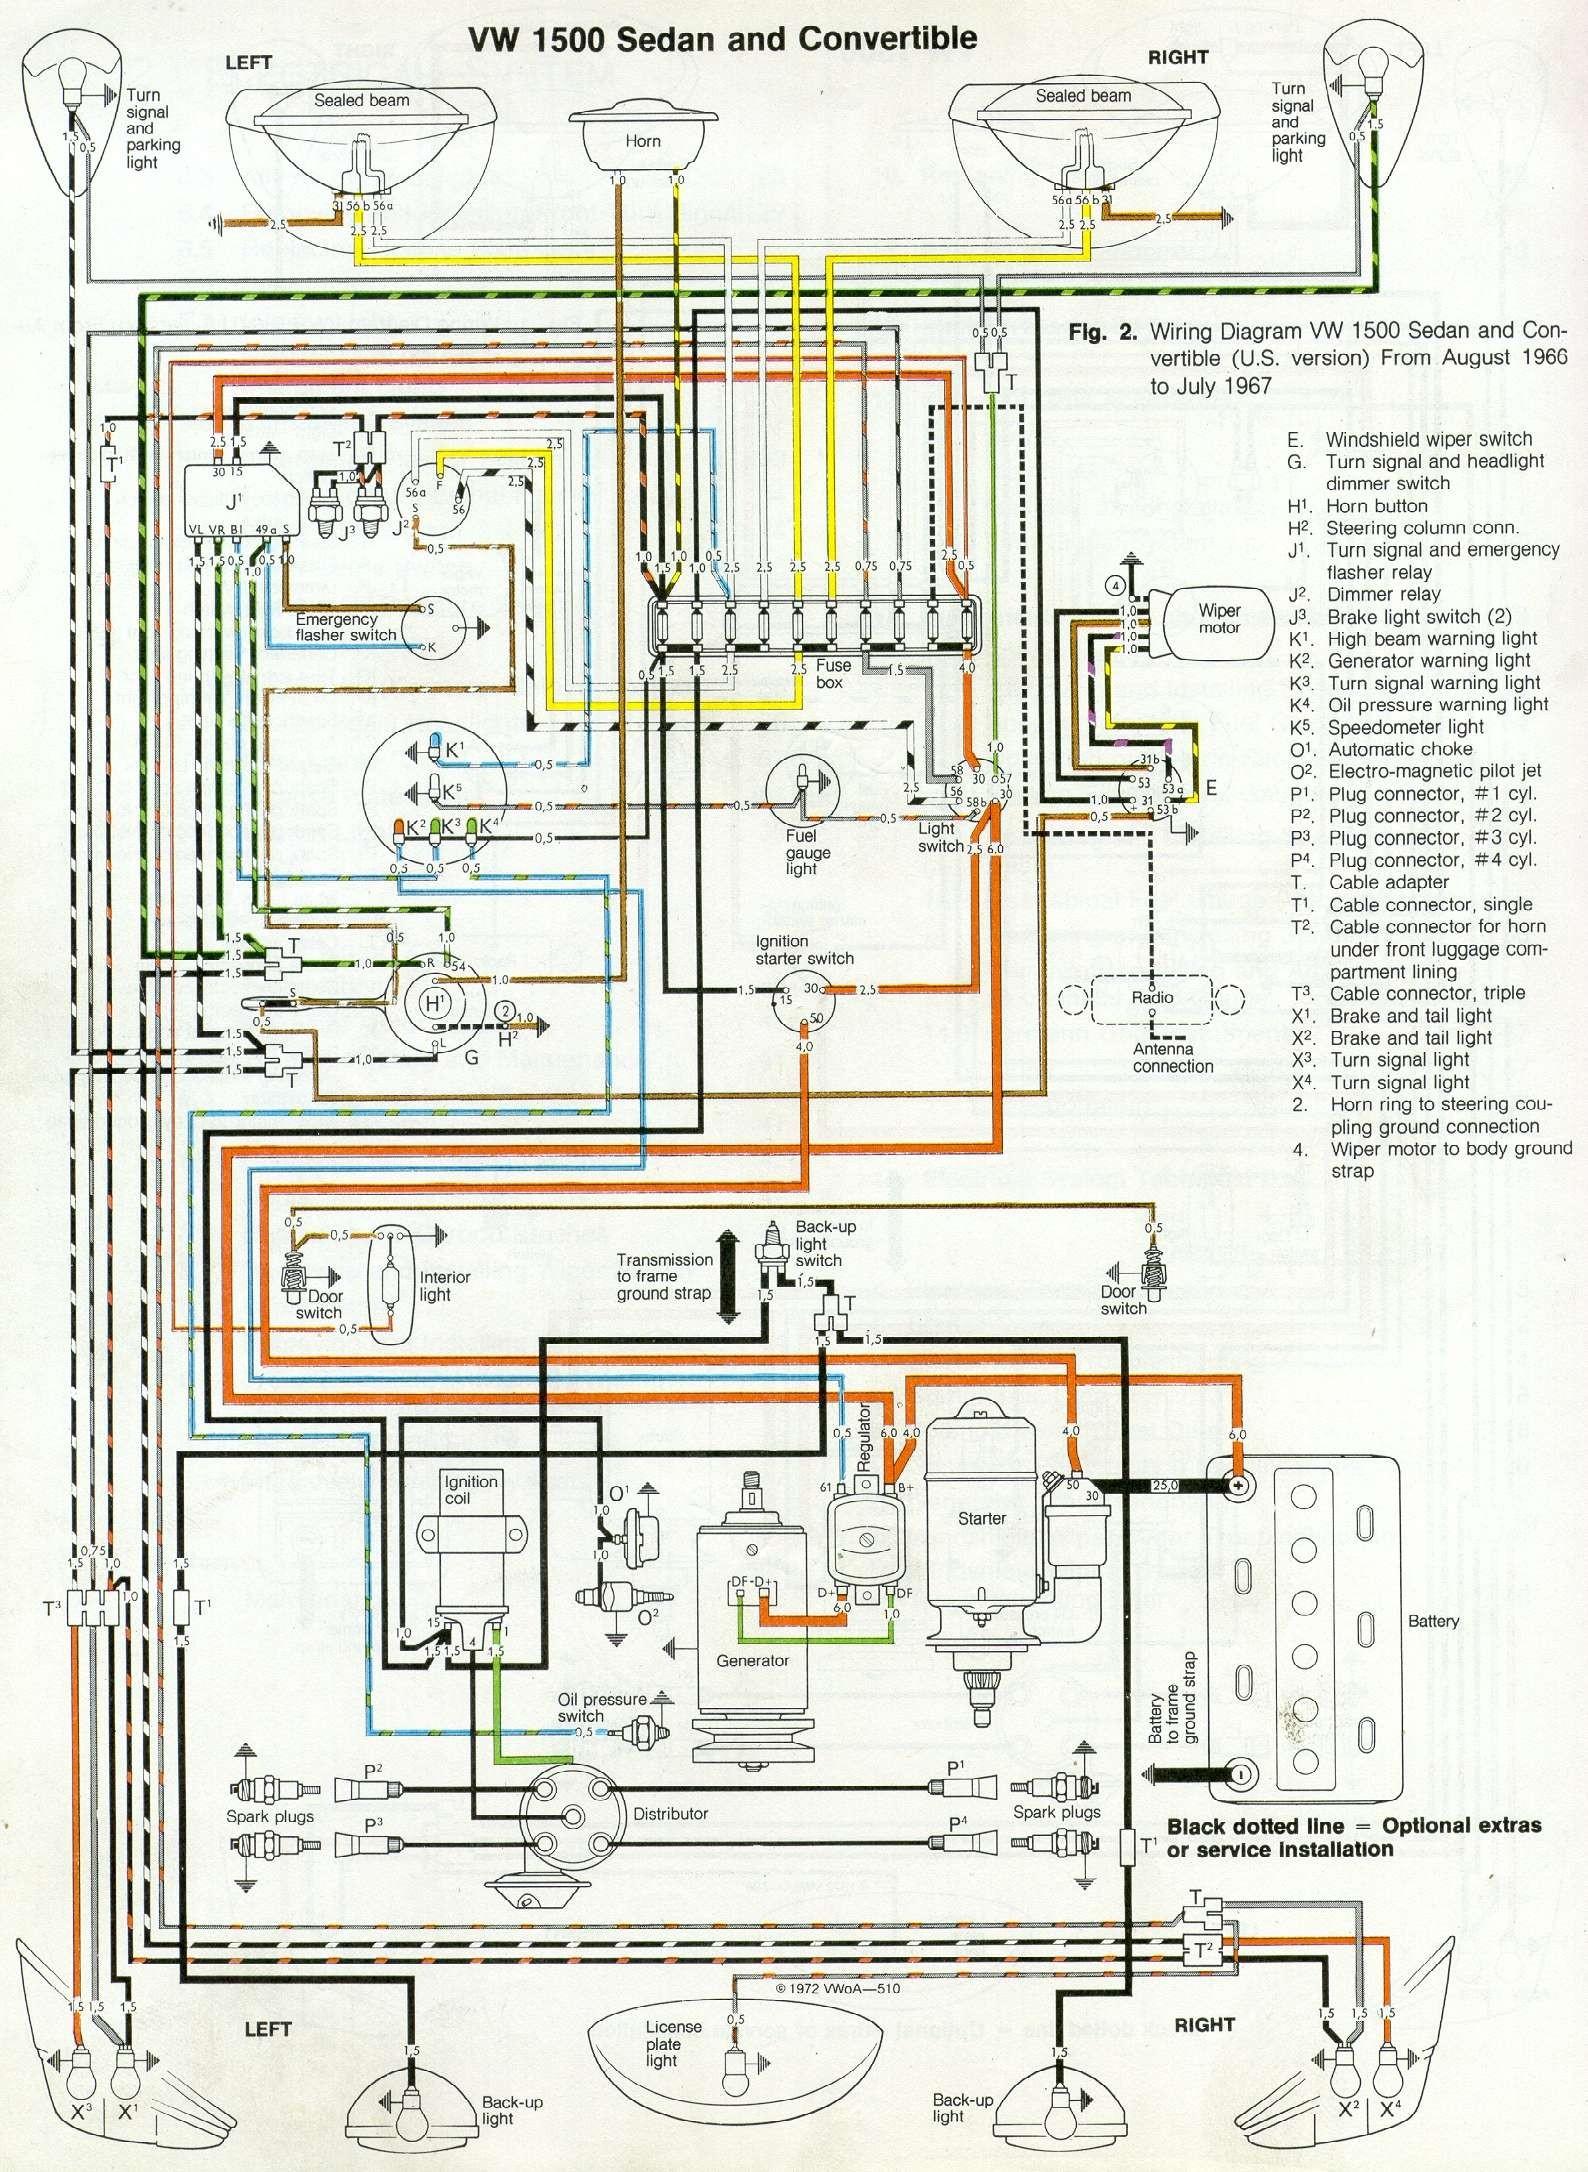 thesamba type 1 wiring diagrams rh thesamba 1965 VW Beetle Wiring Diagram VW Beetle